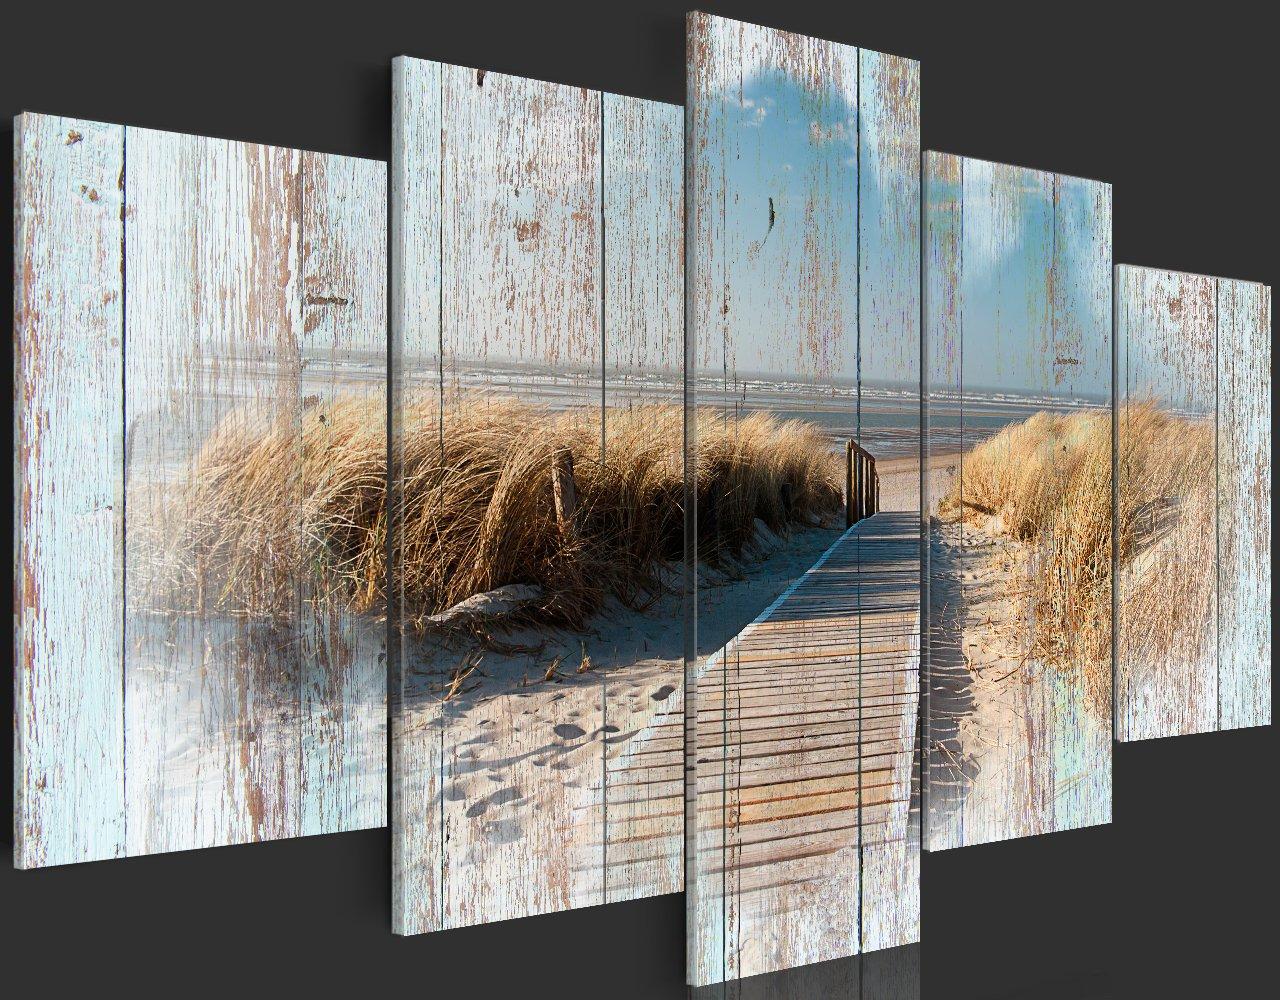 Murando   Bilder 100x50 Cm   Vlies Leinwandbild   5 Teilig   Kunstdruck    Modern   Wandbilder XXL   Wanddekoration   Design   Wand Bild ...